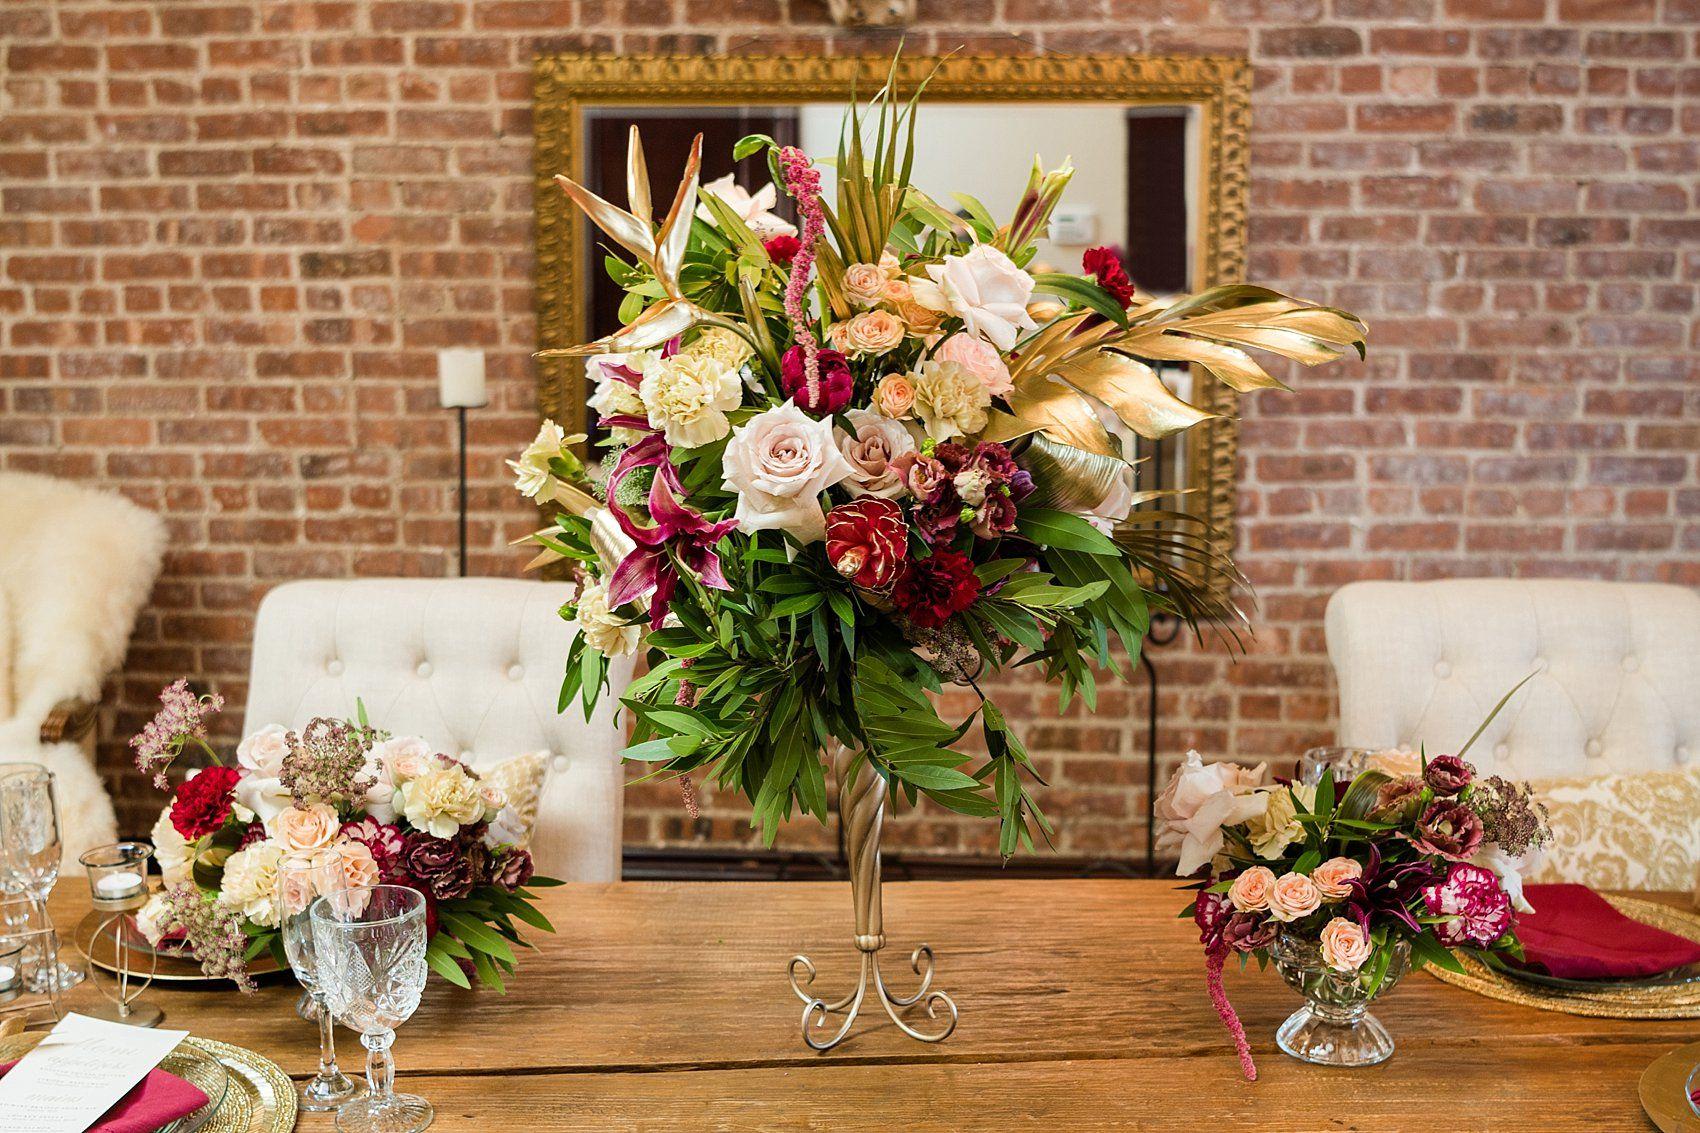 Deity Nyc Venue Floral Design Laparis Phillips Brooklyn Blooms